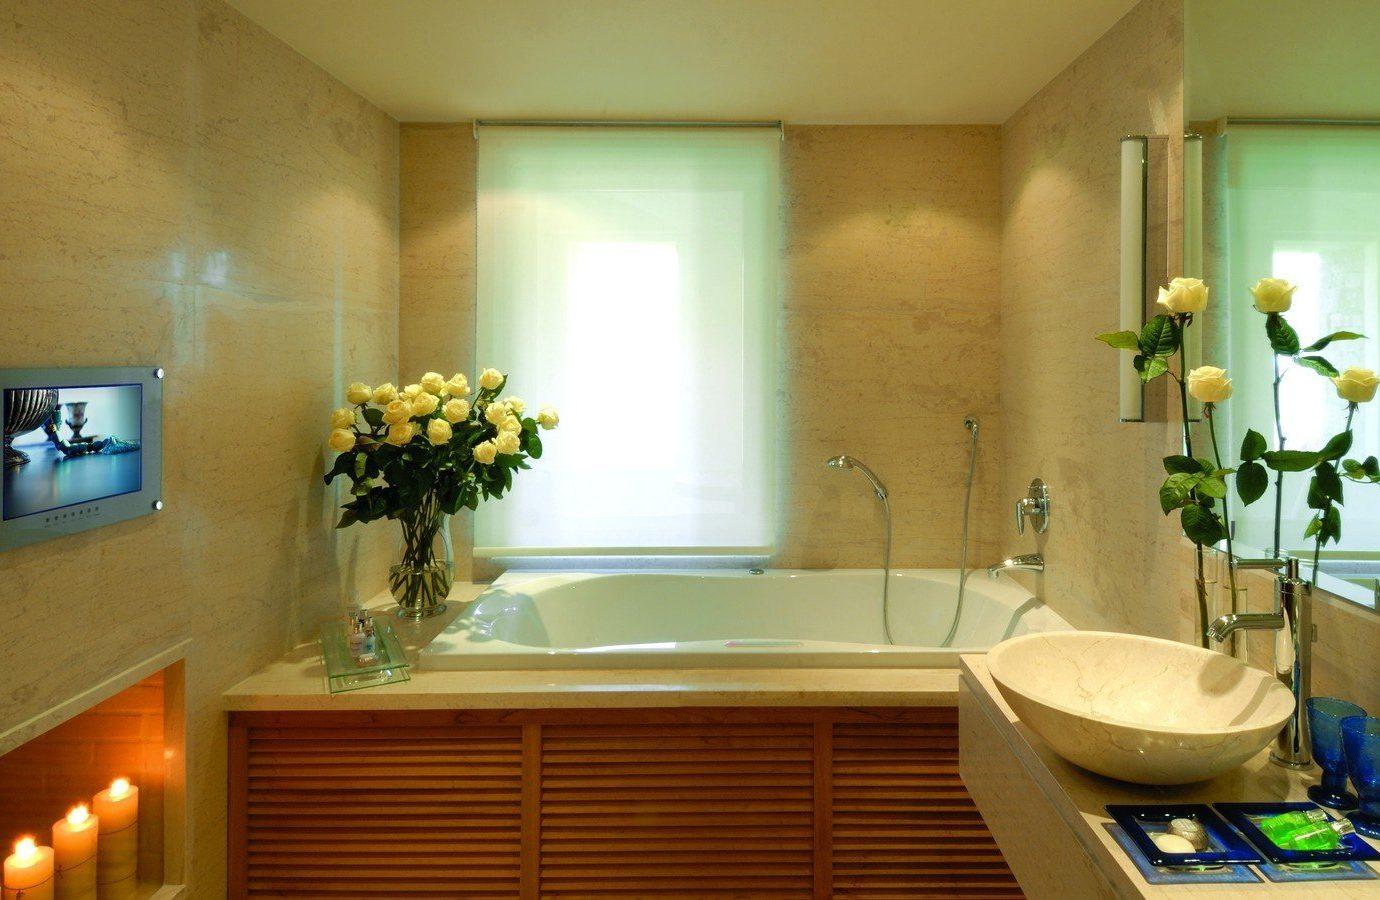 Hotels Luxury Travel wall indoor bathroom room interior design home Suite ceiling estate window daylighting interior designer